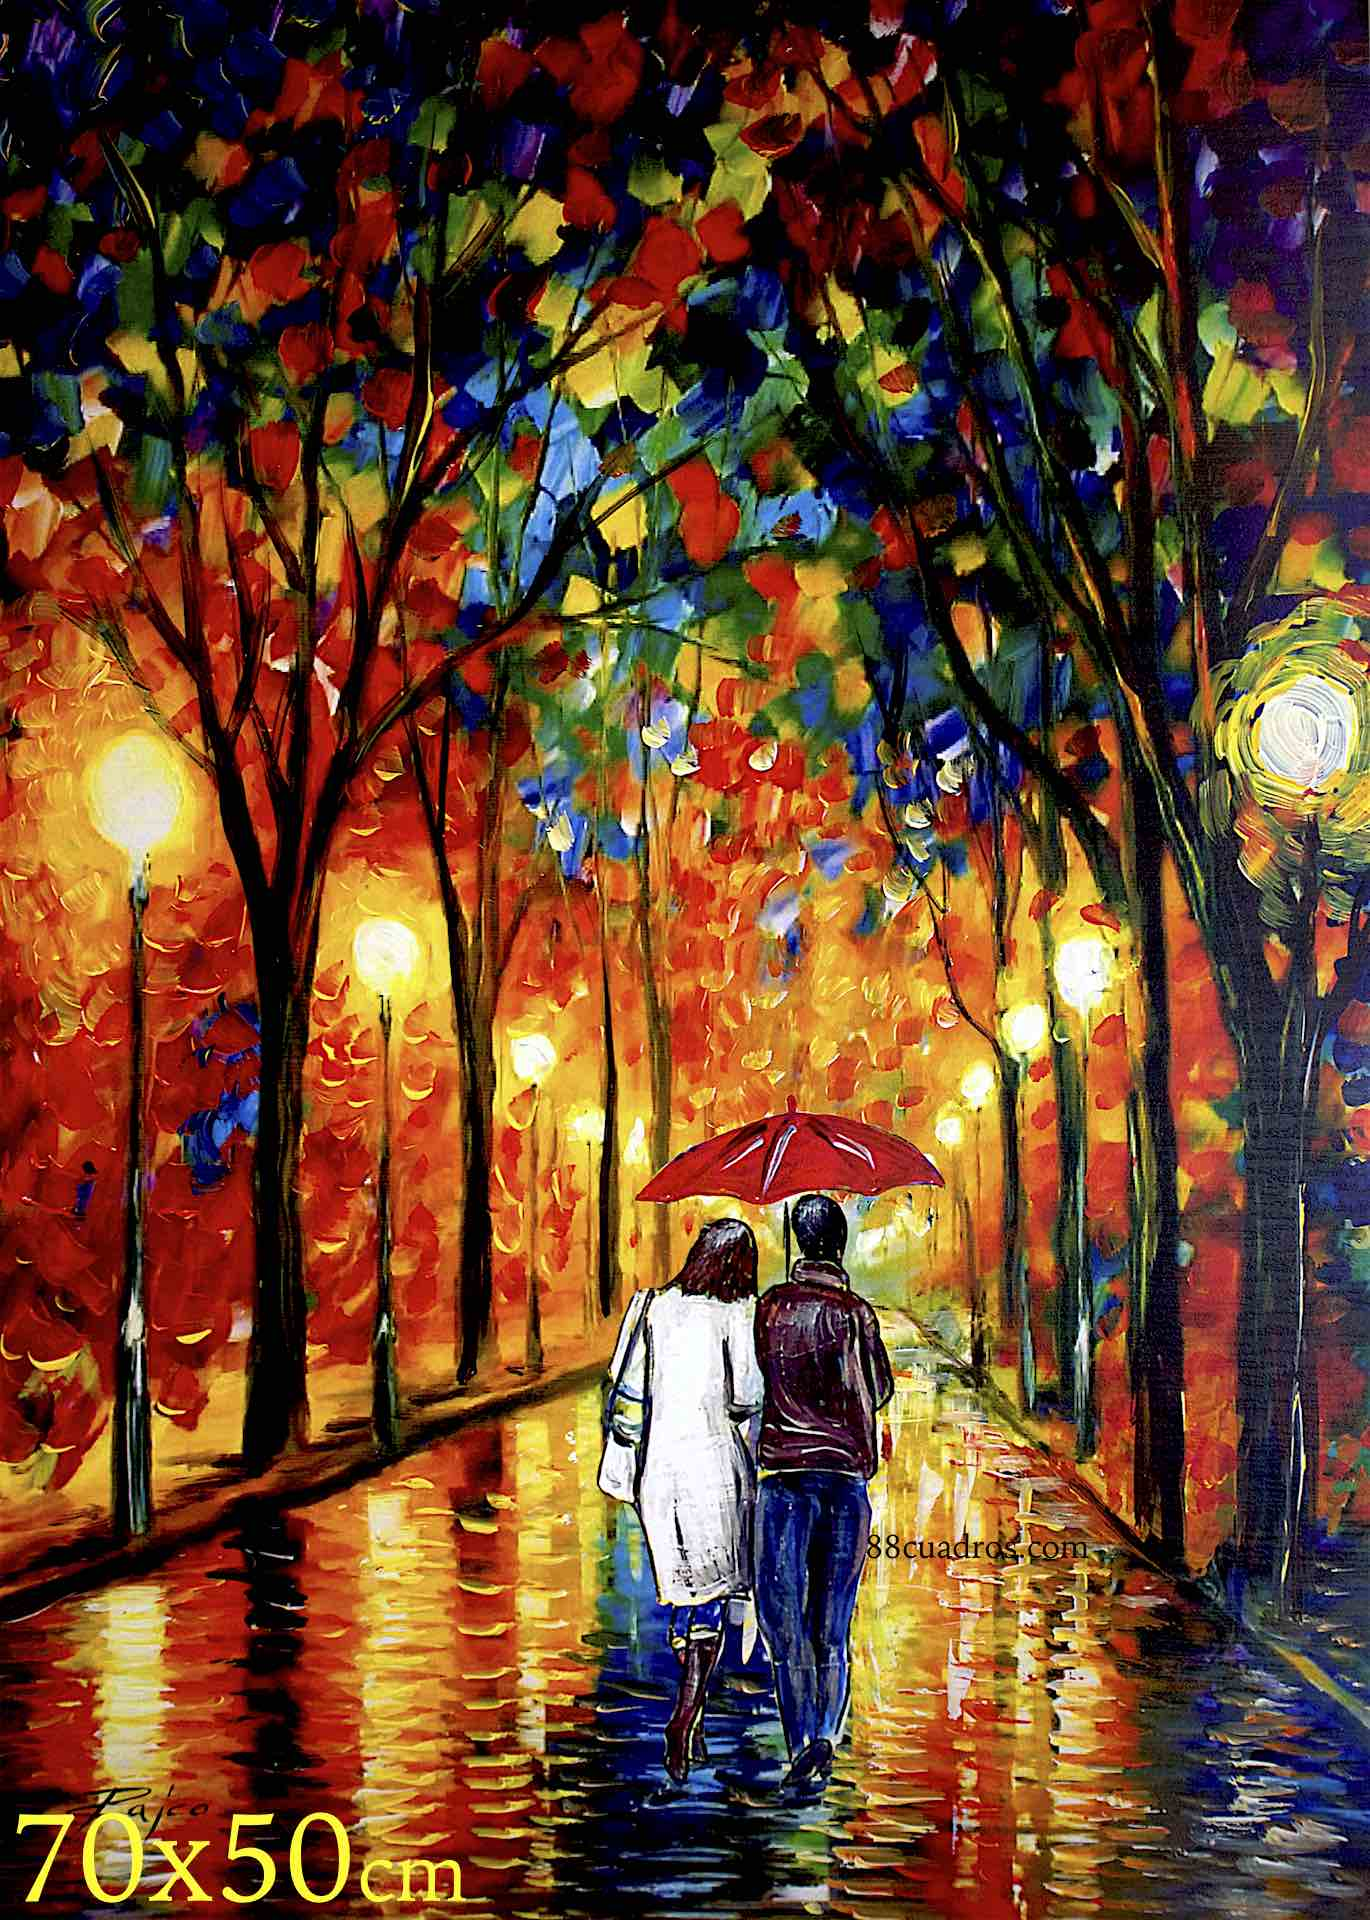 Paraguas rojo 88 cuadros a 8 euros for Enmarcar cuadros precios